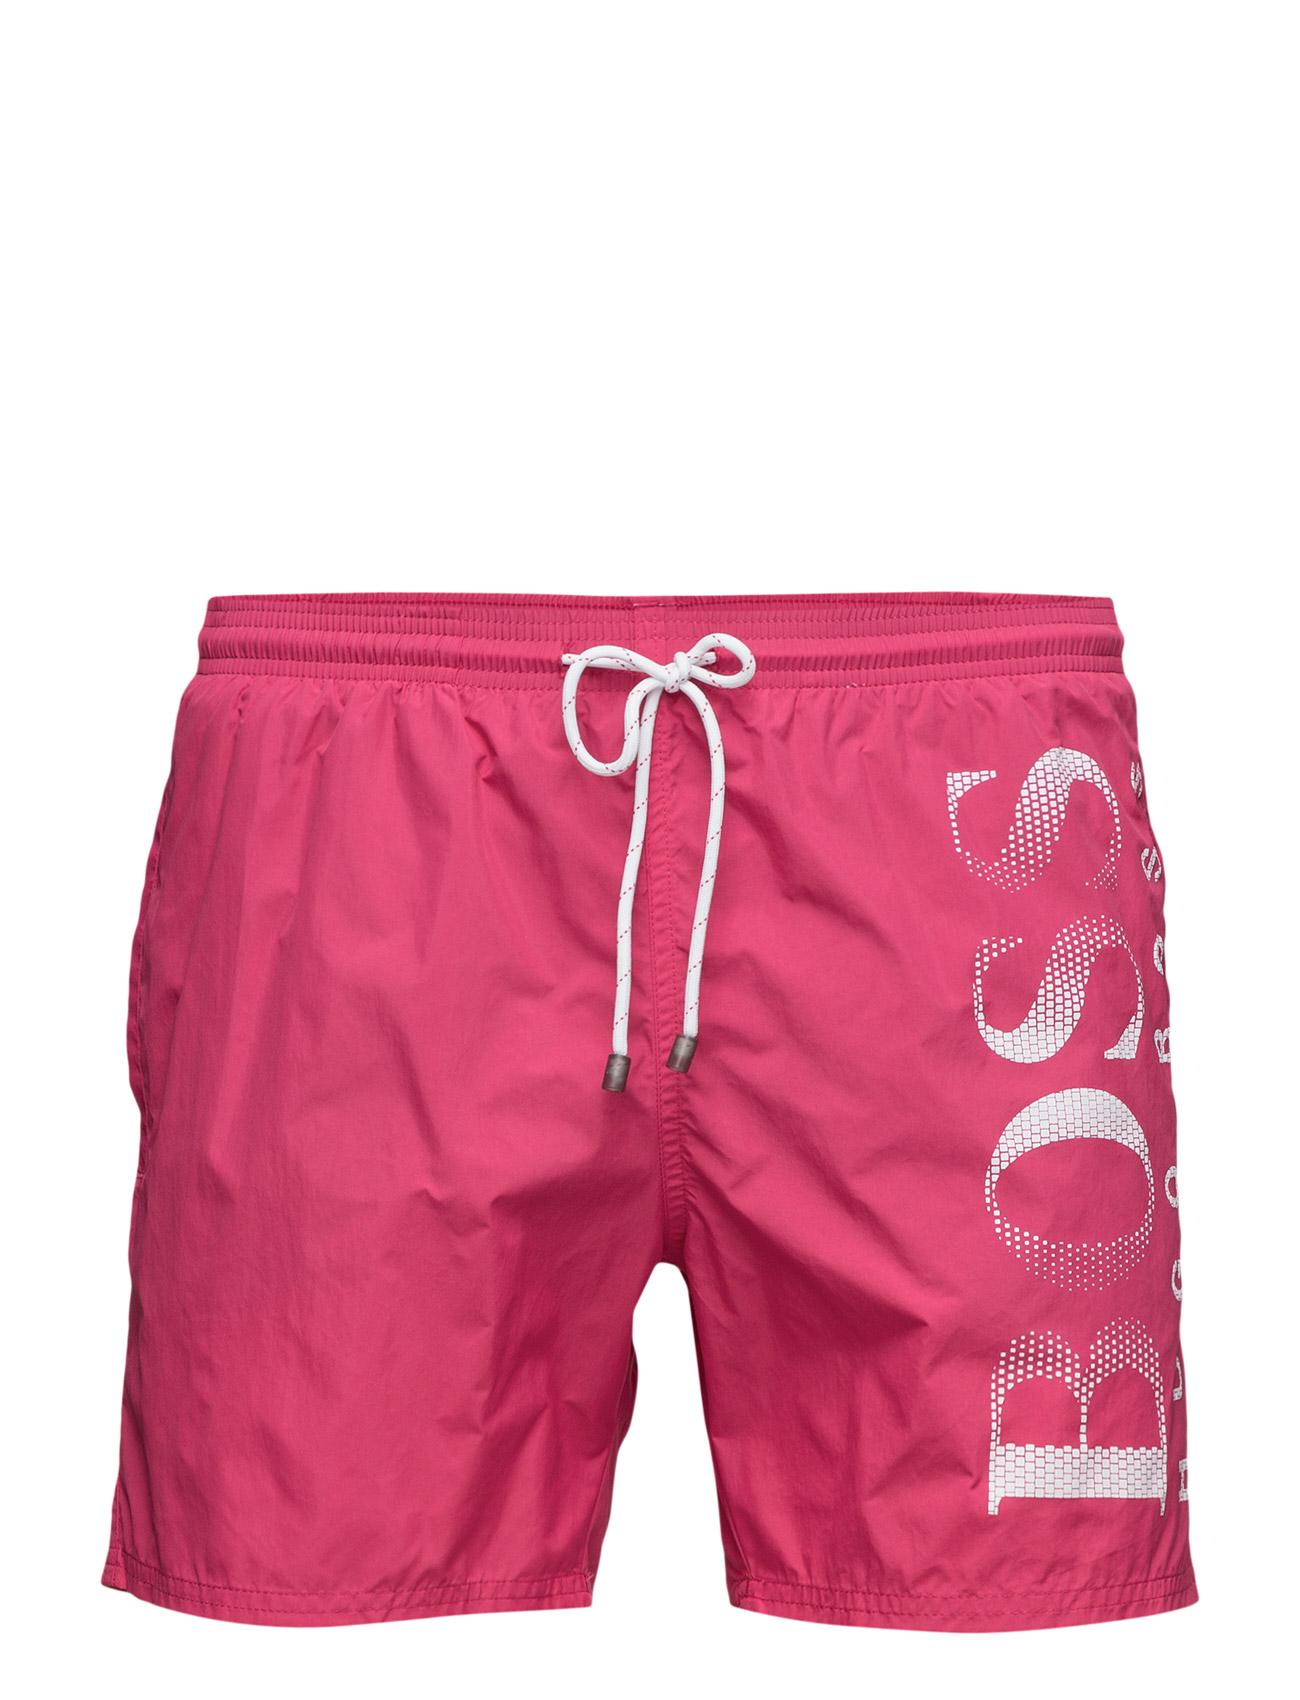 Octopus BOSS Shorts til Herrer i Bright Pink